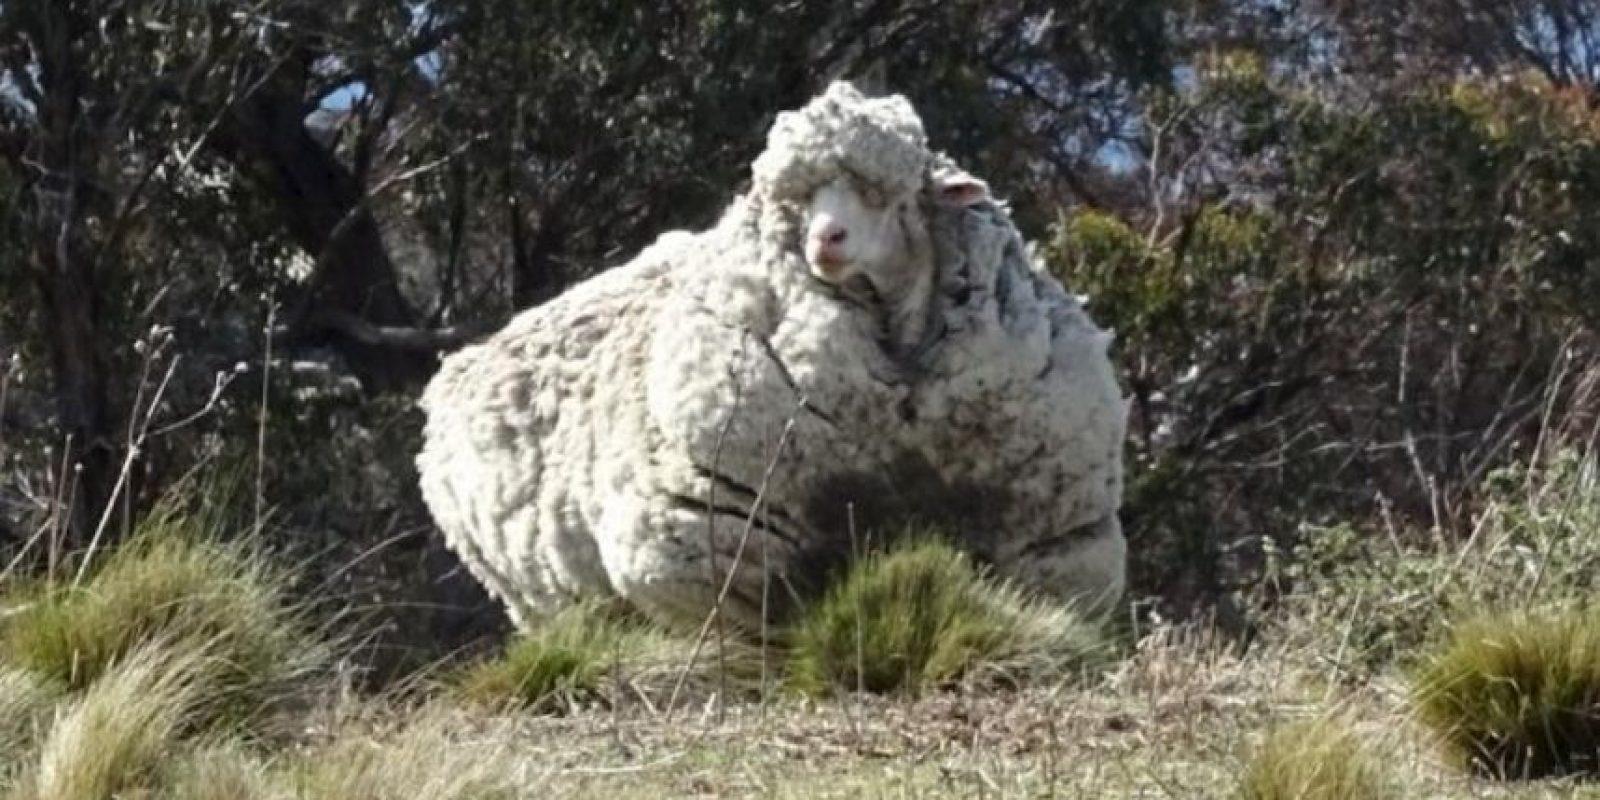 Le retiraron más de 40 kilogramos de lana. Foto:Vía Twitter @tvendange